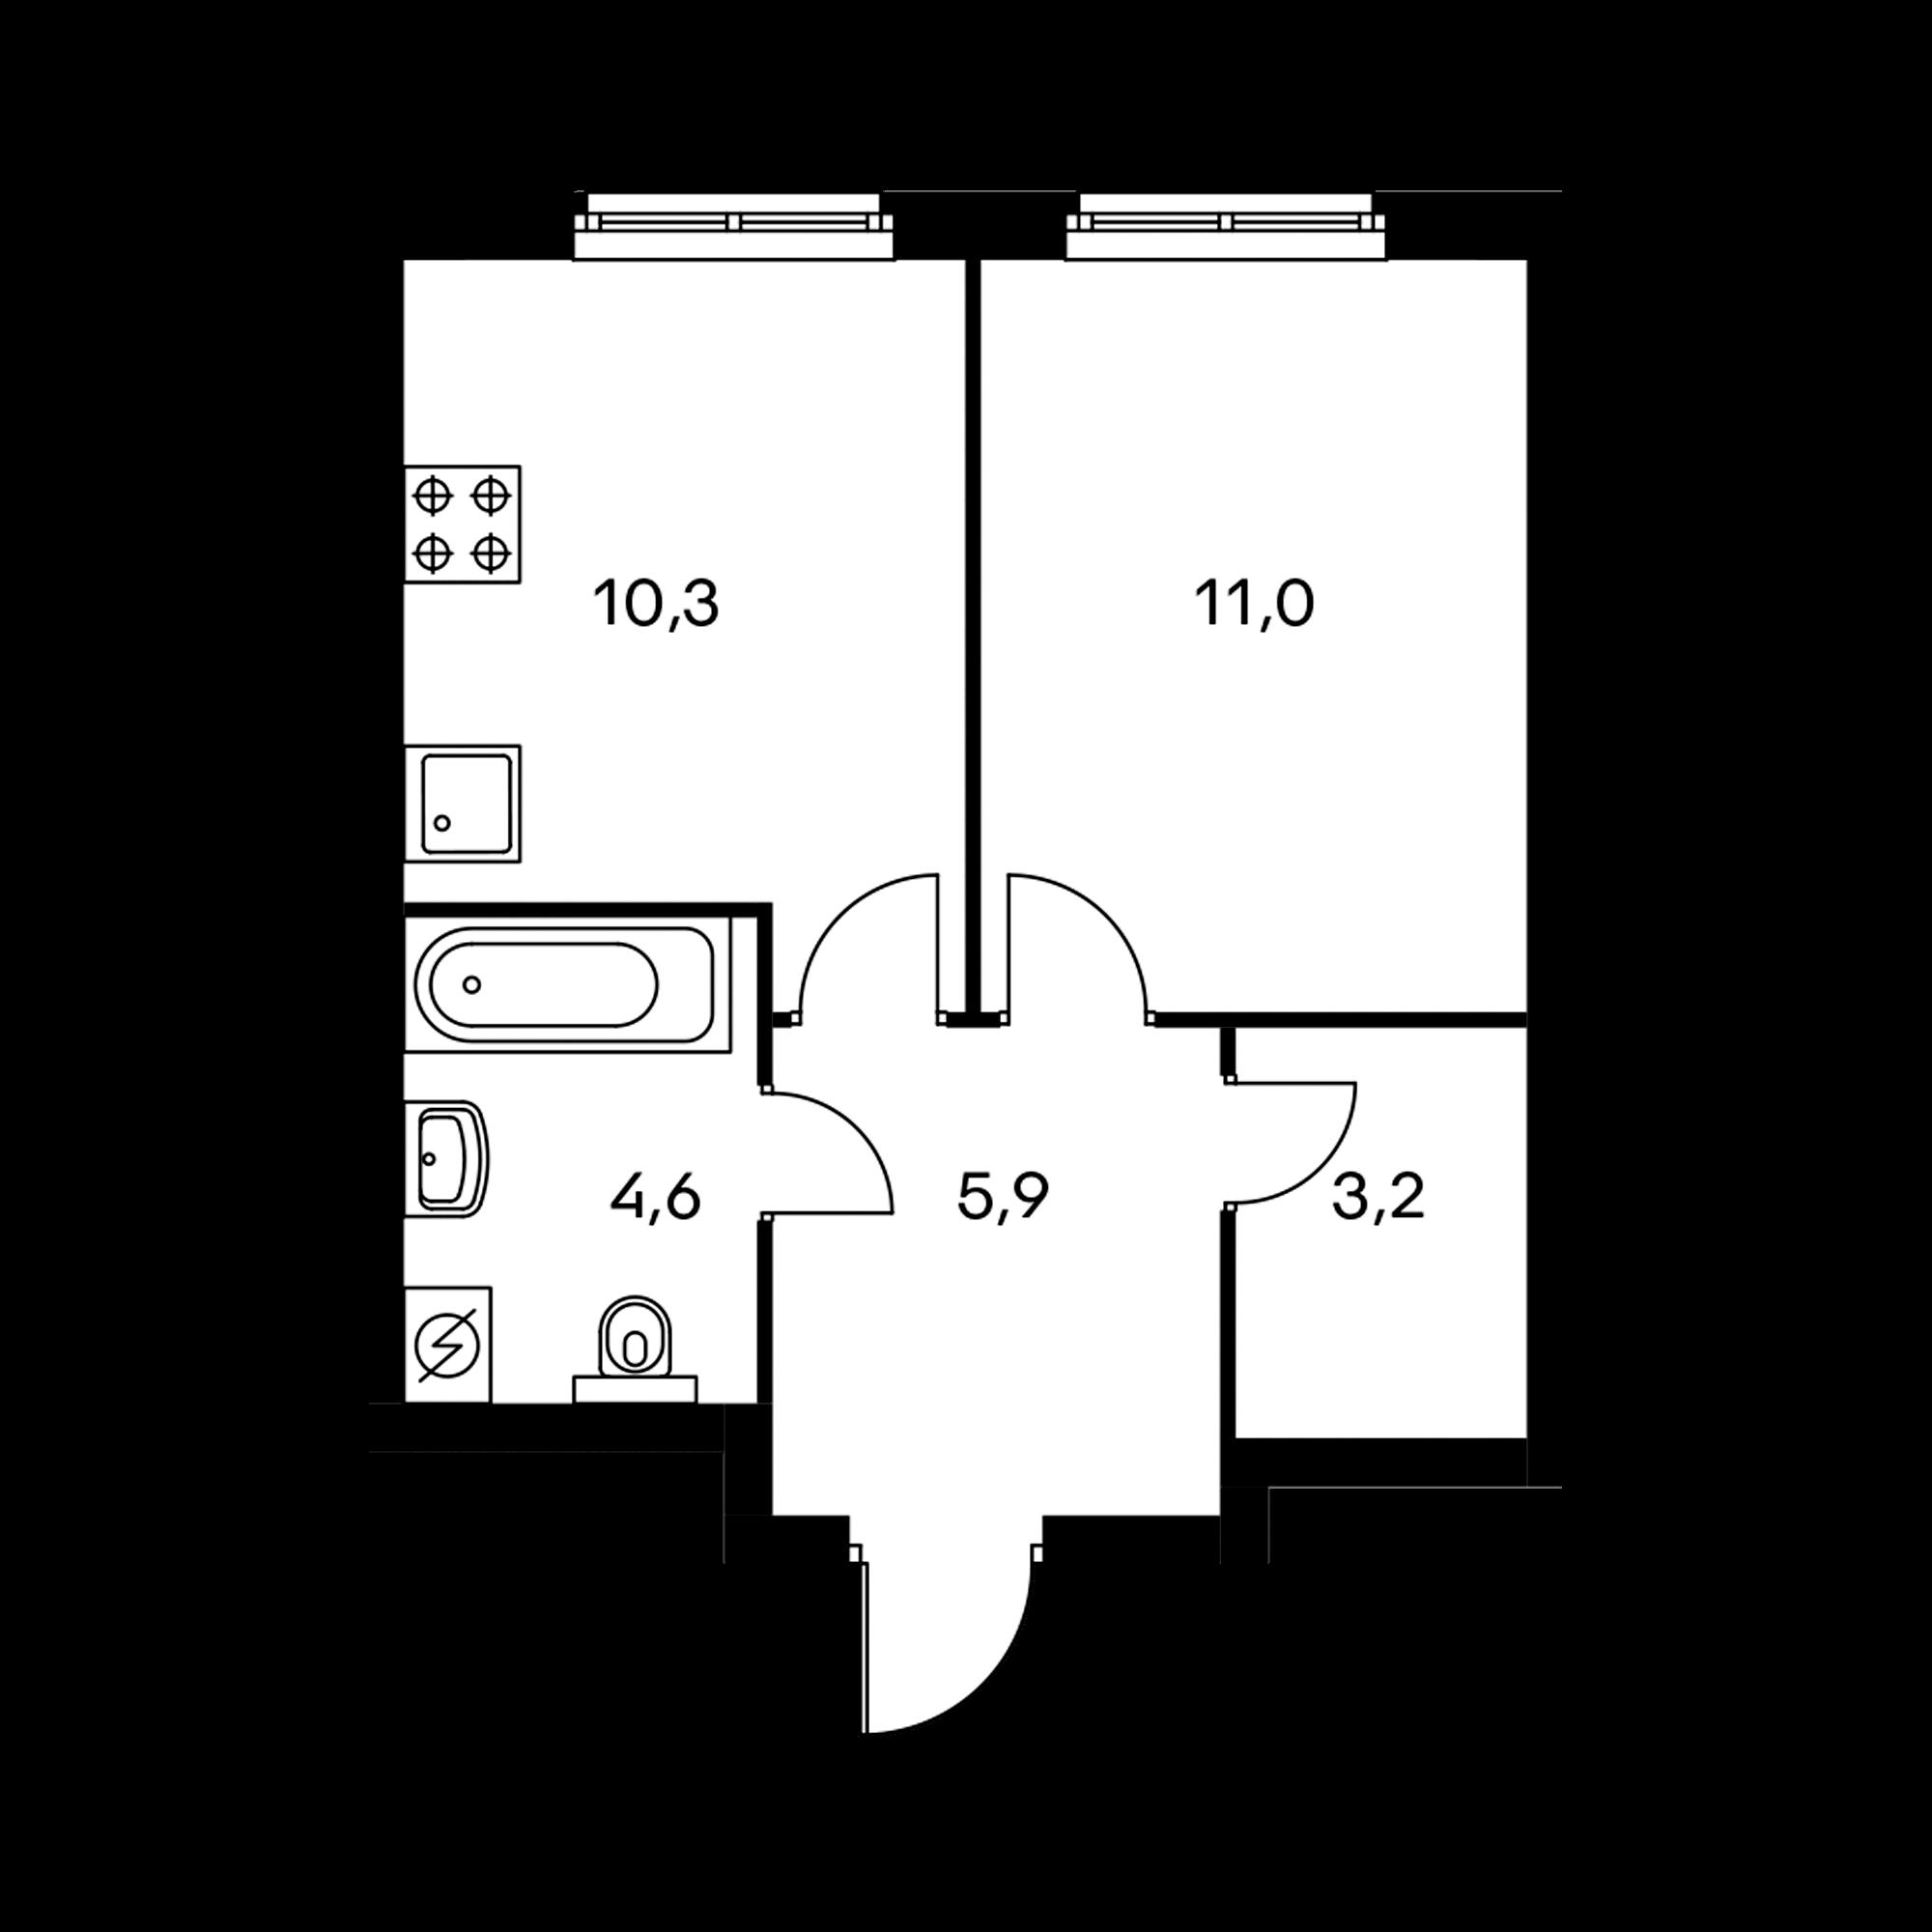 1KM1_6.0